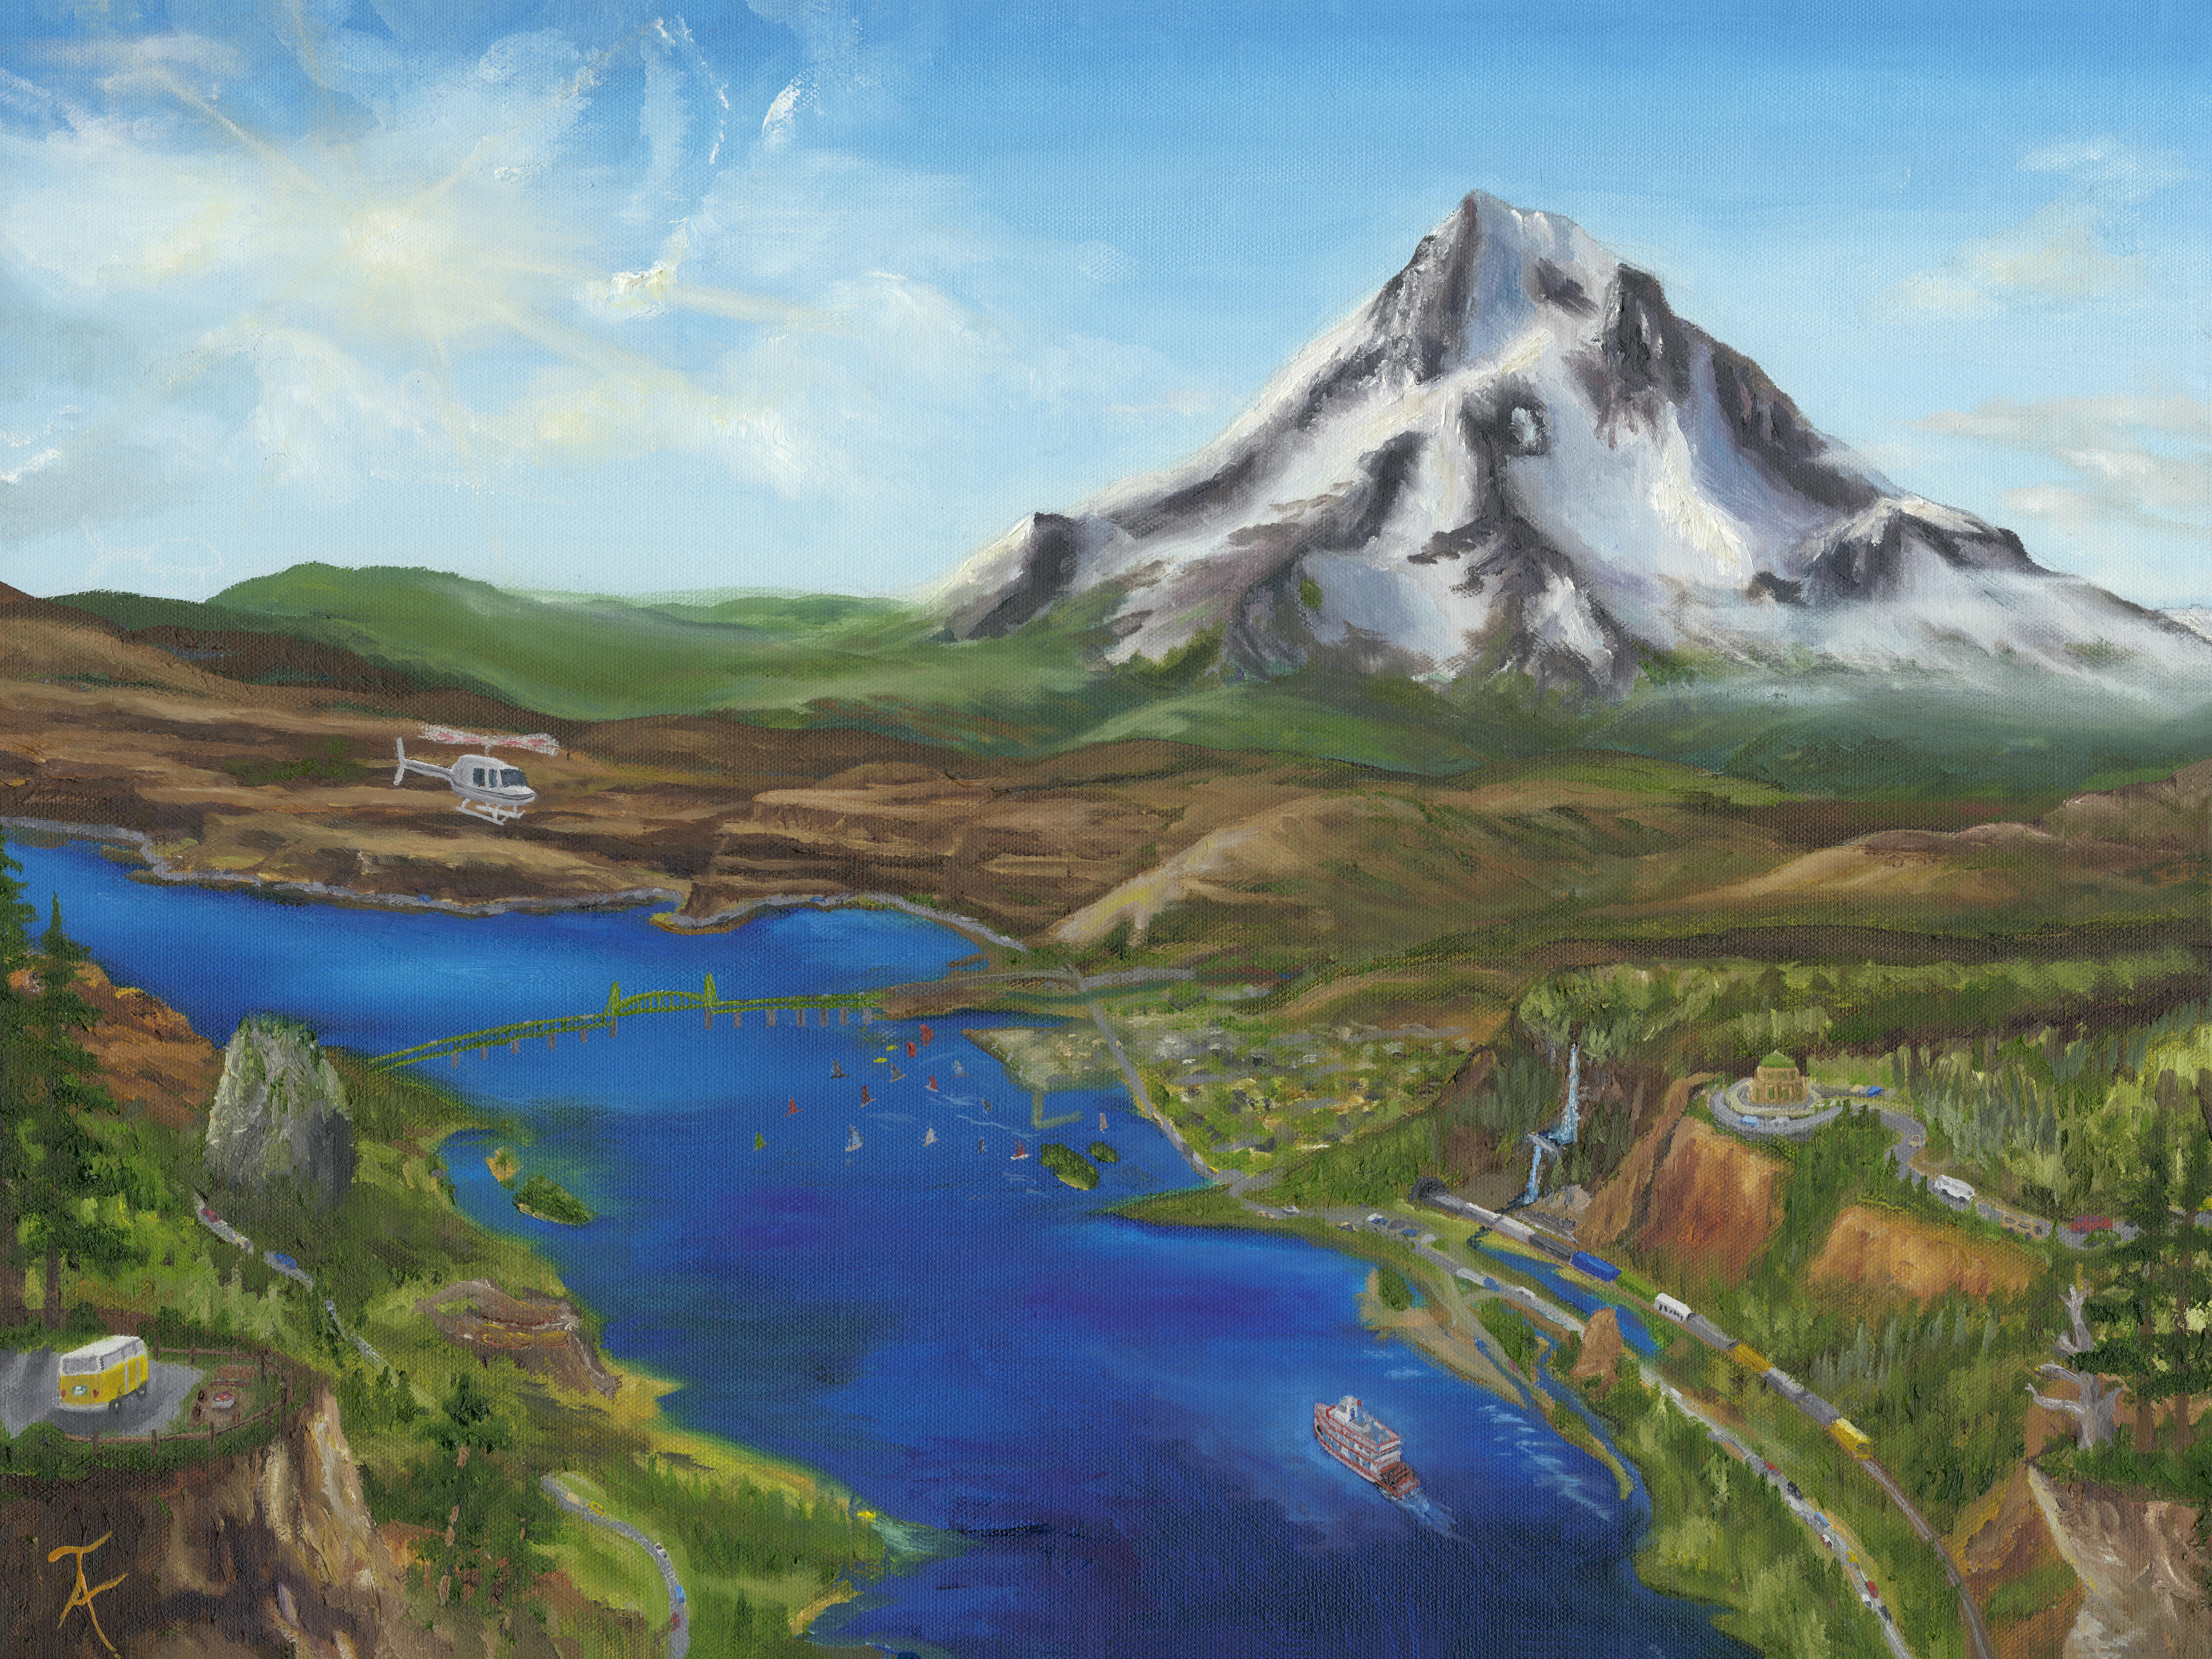 Taylor Allen Mt HoodTravel Painting 24 X 18 MF FINAL300res